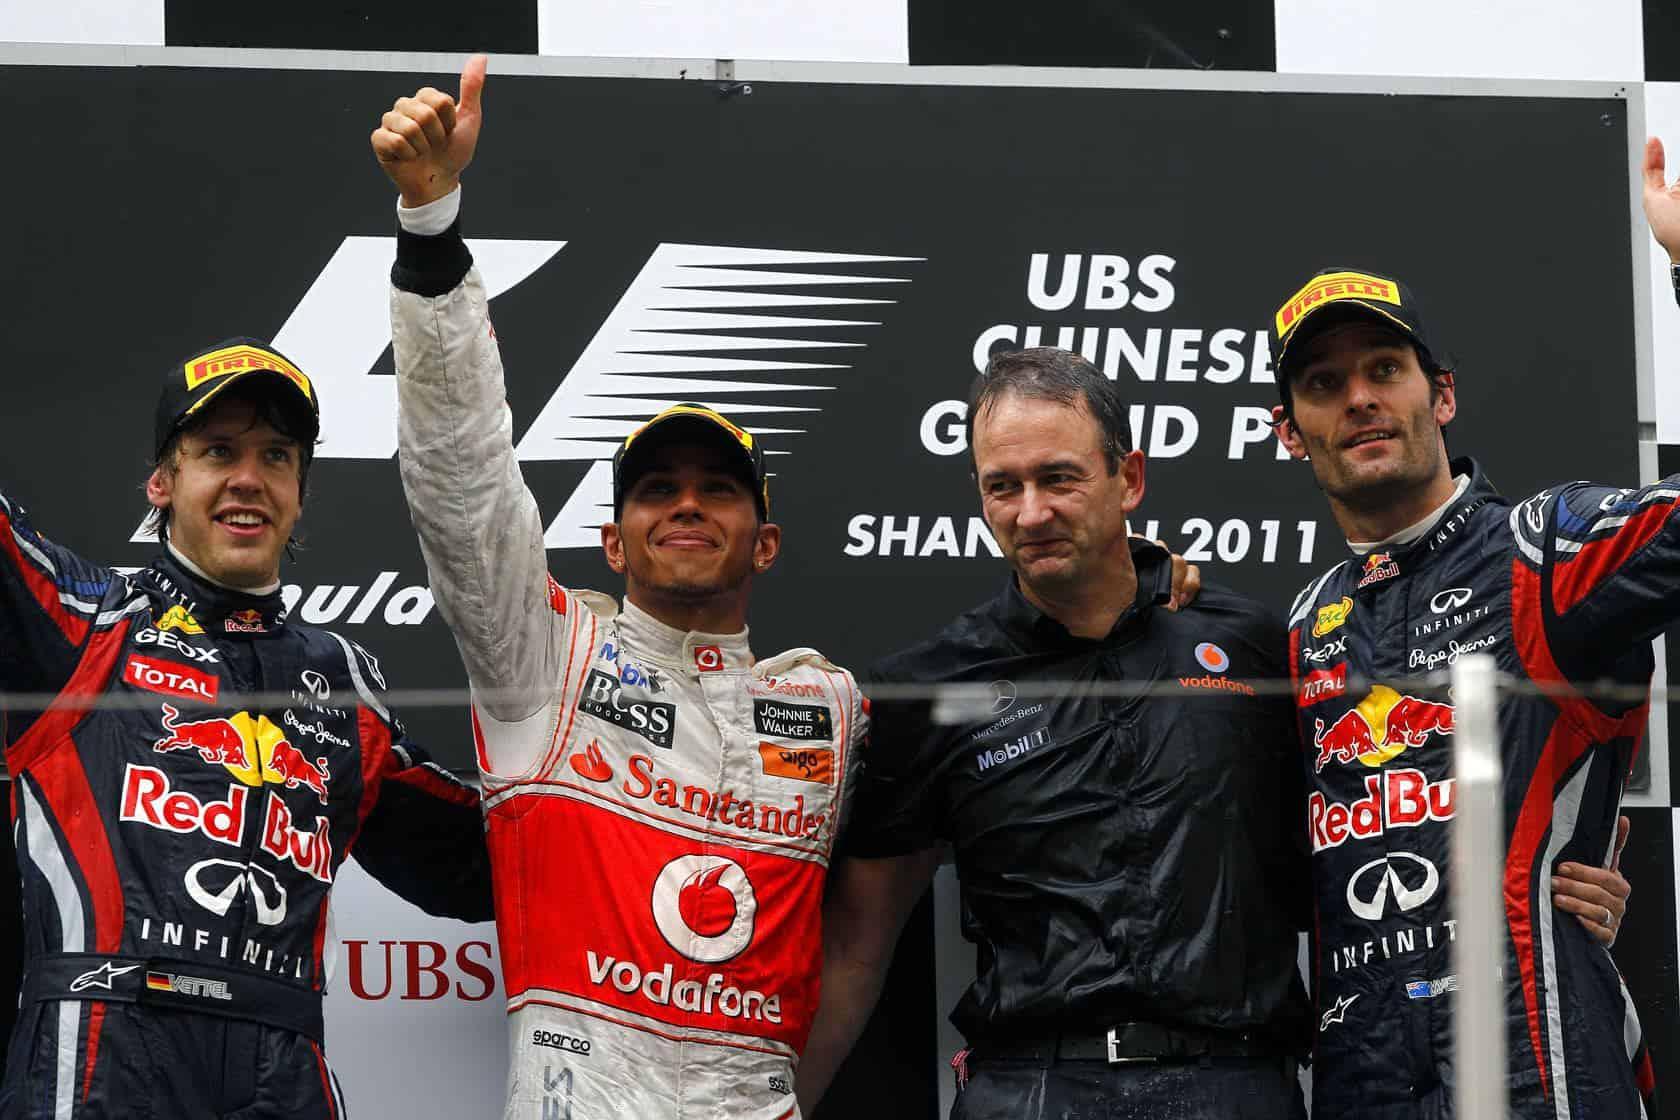 Chinese GP F1 2011 podium Hamilton Vettel Webber